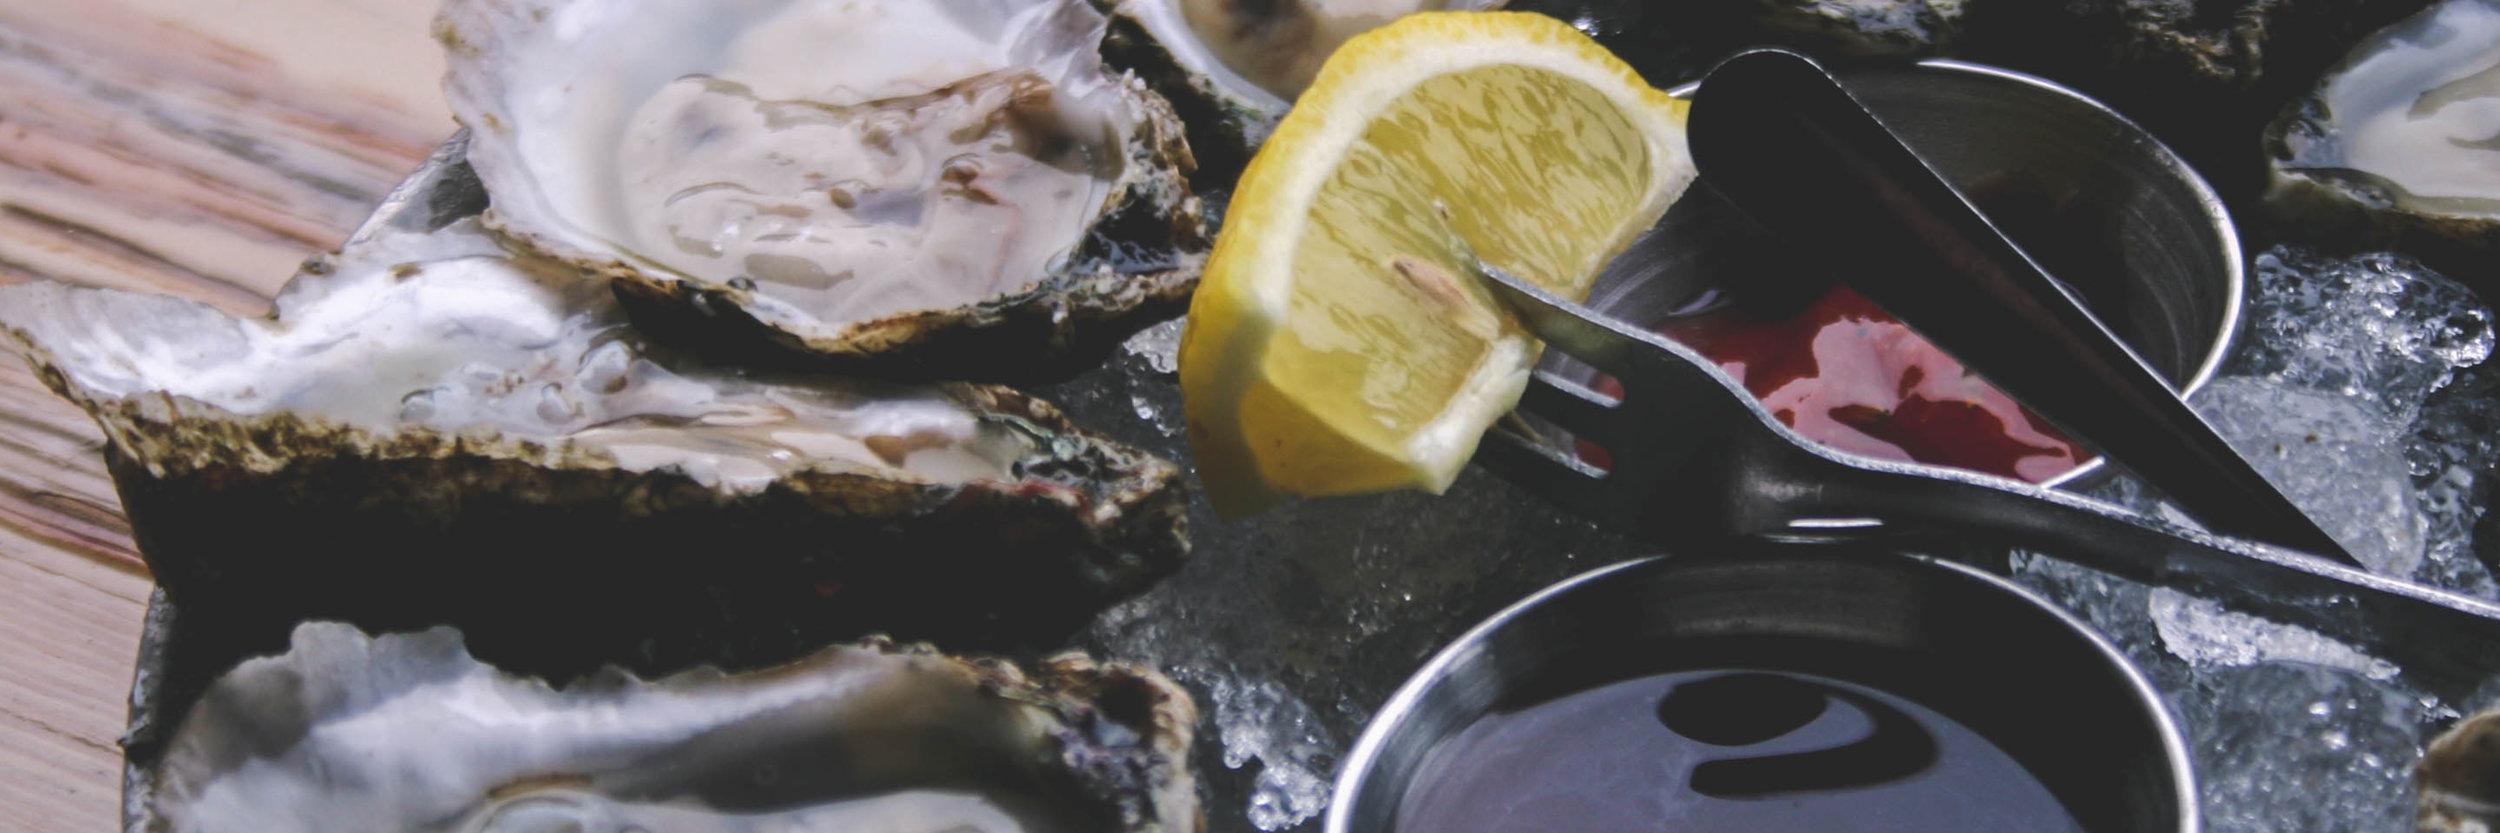 Raw Oysters from Merroir Tasting Room - Image Credit: VAfoodie